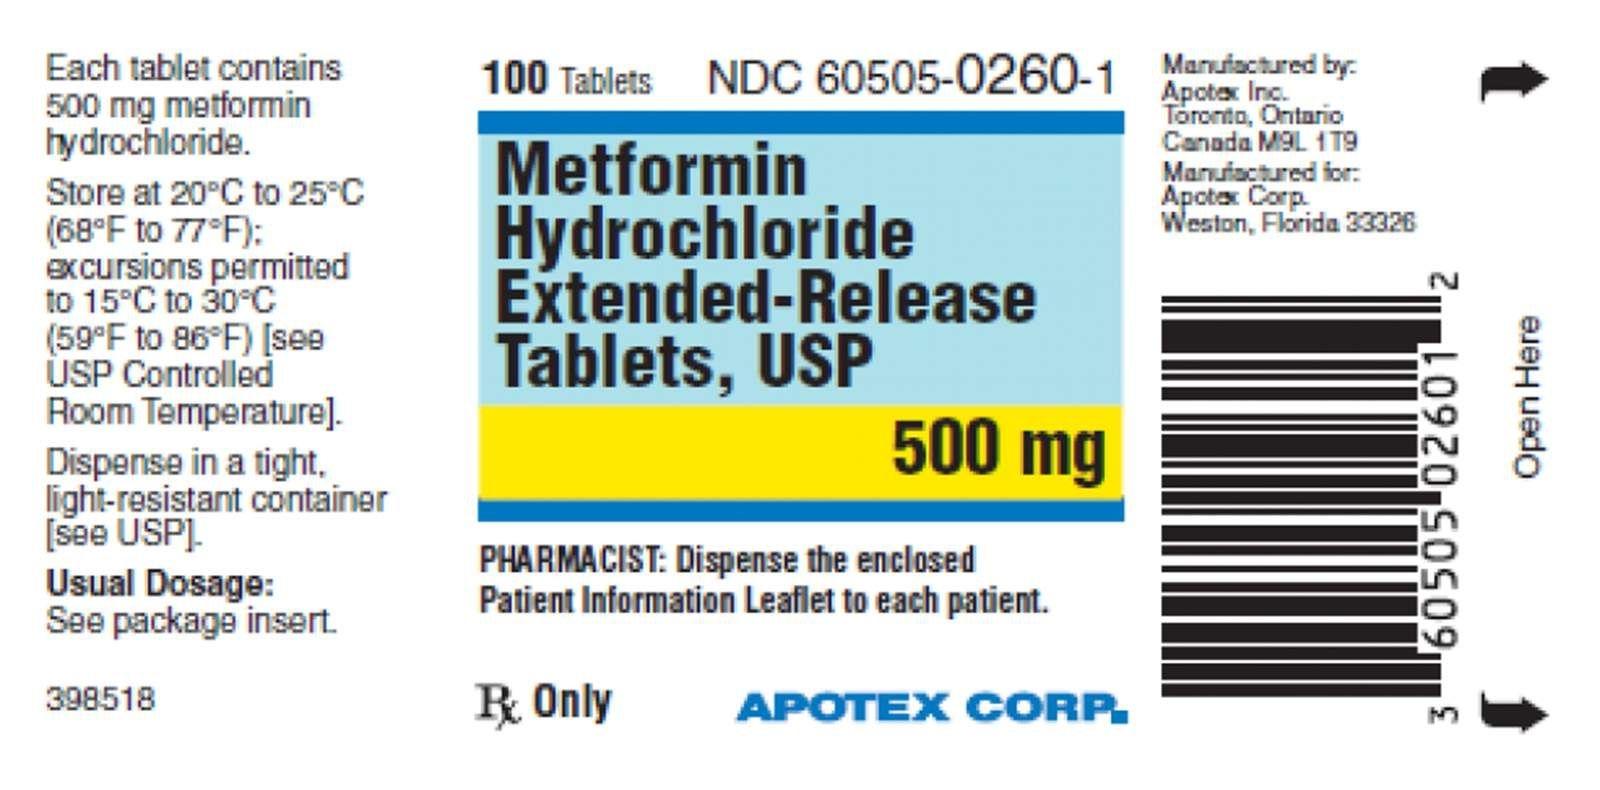 Fda Finds Contamination In Several Brands Of Diabetes Drug